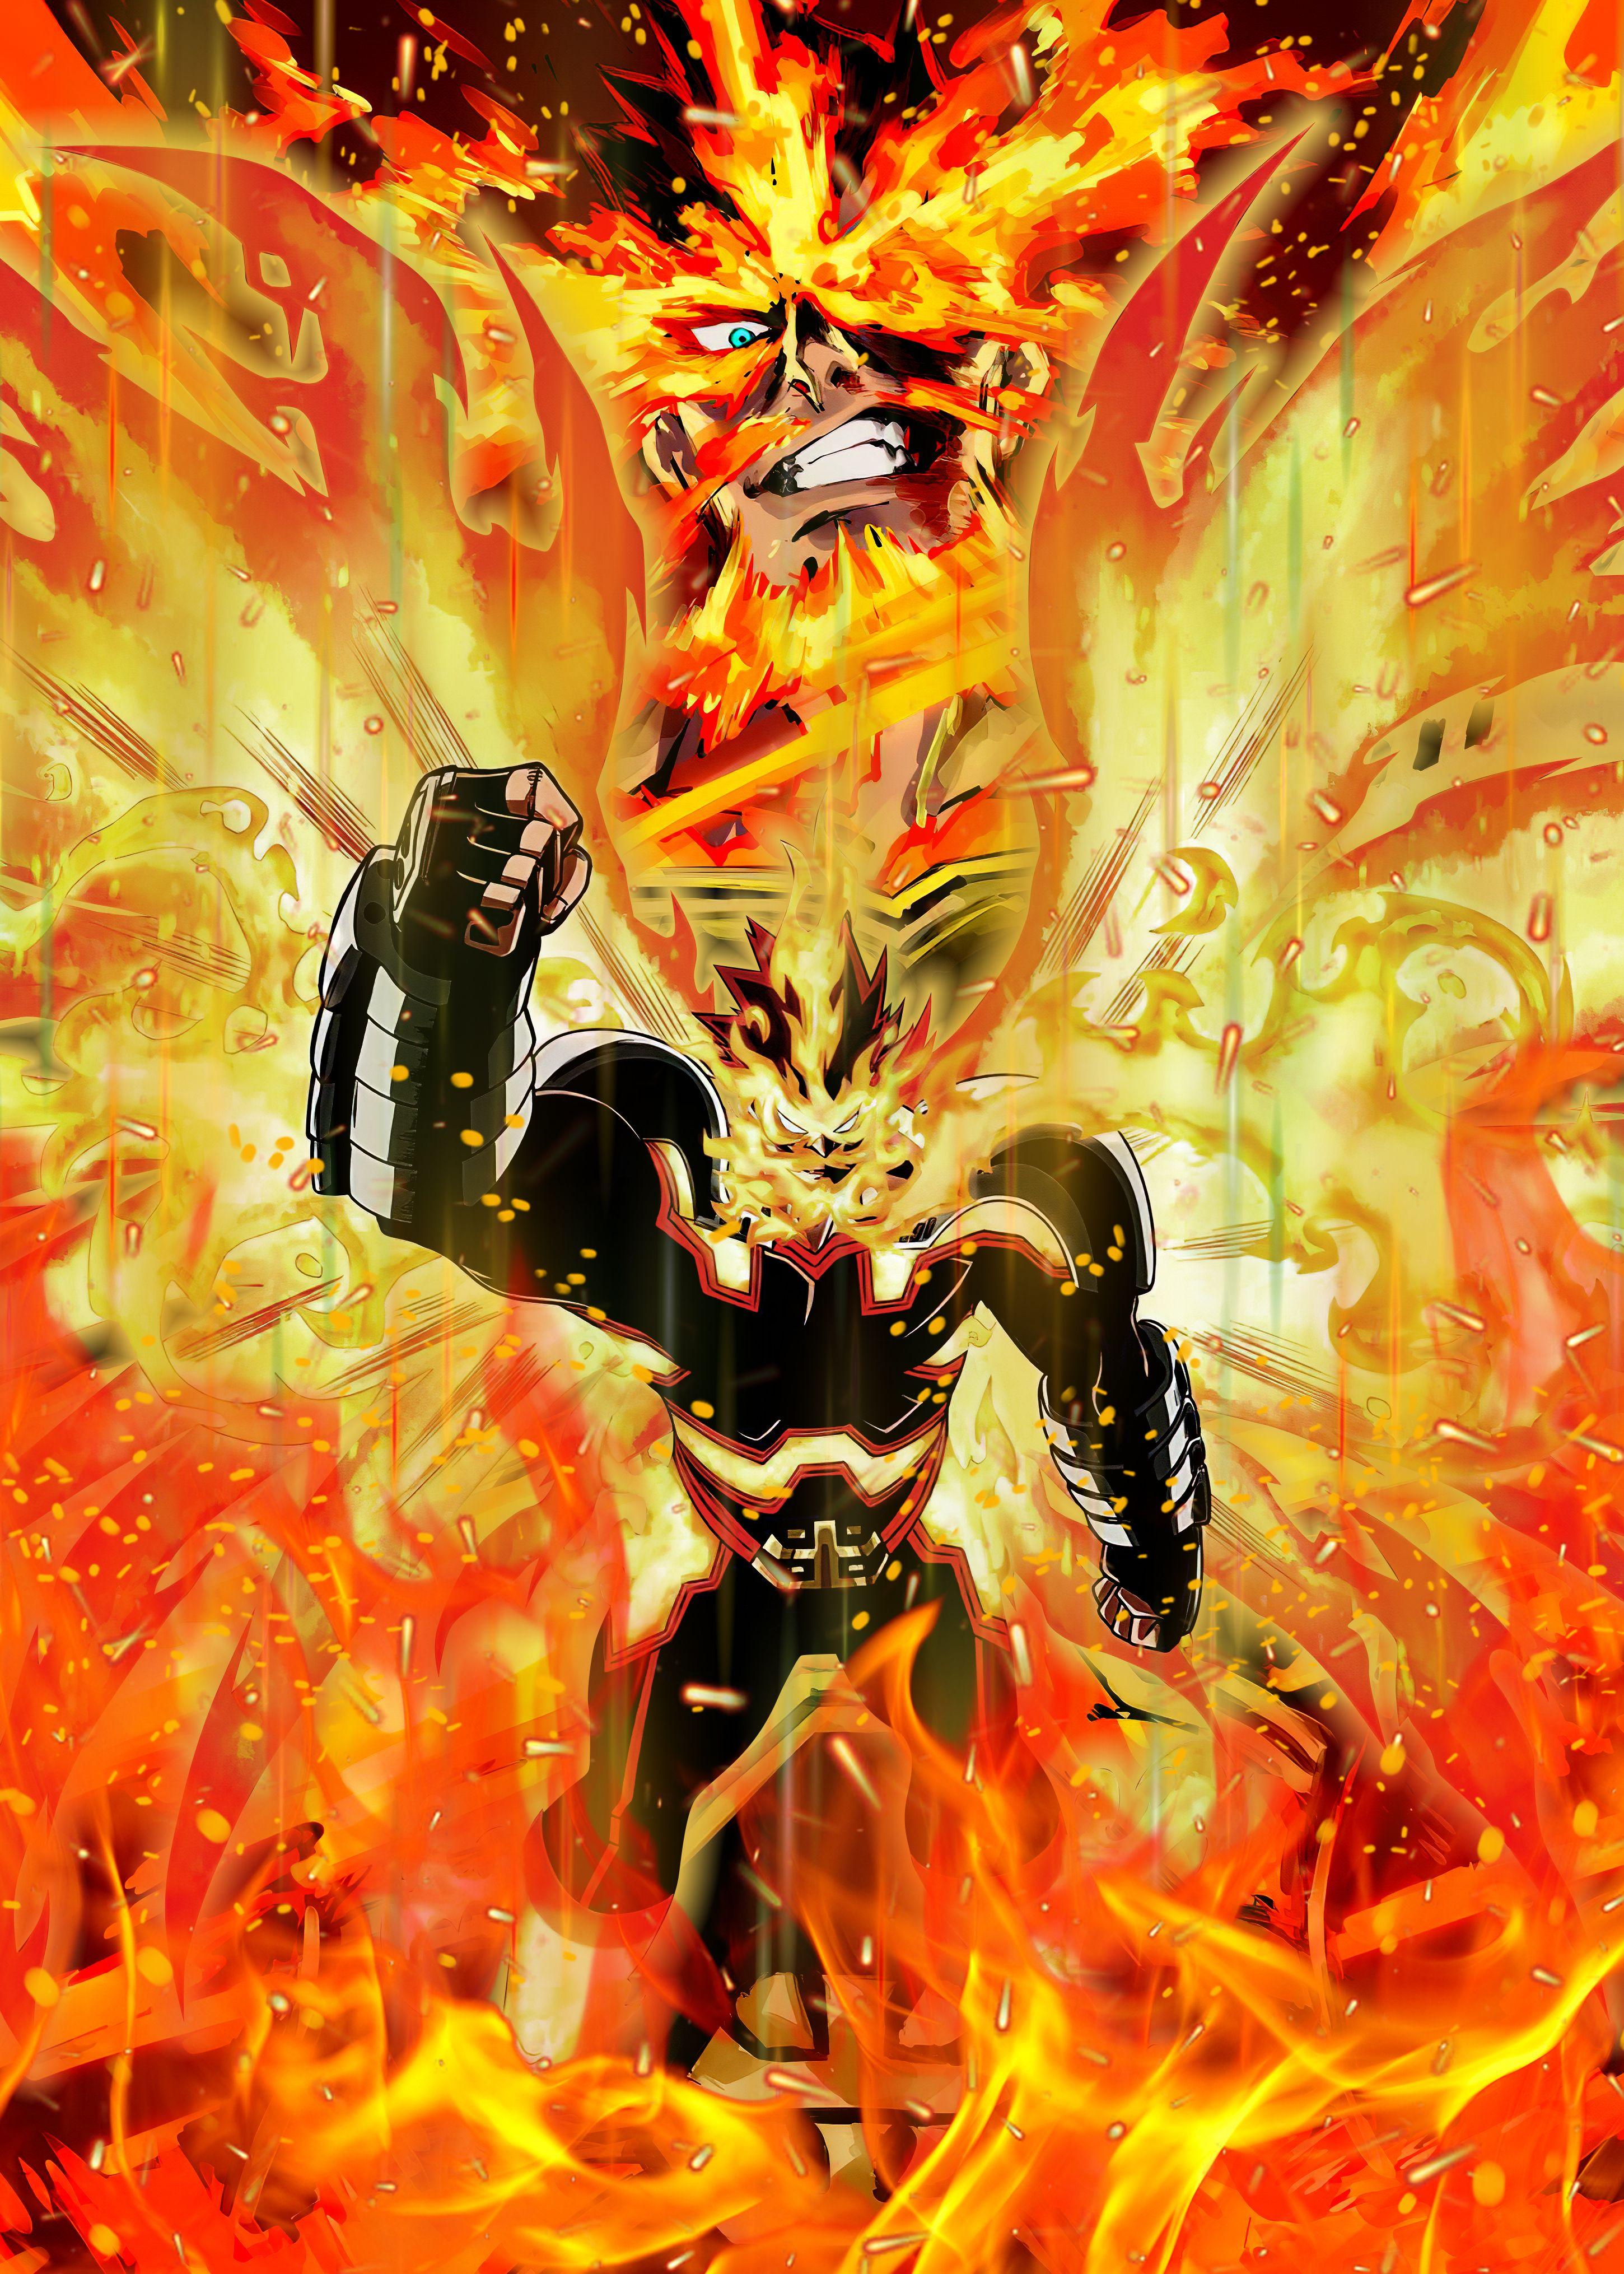 Hd endeavor boku no hero academia anime wallpaper description. My Hero Academia (Endeavor) Metal Poster | Hero, Hero ...